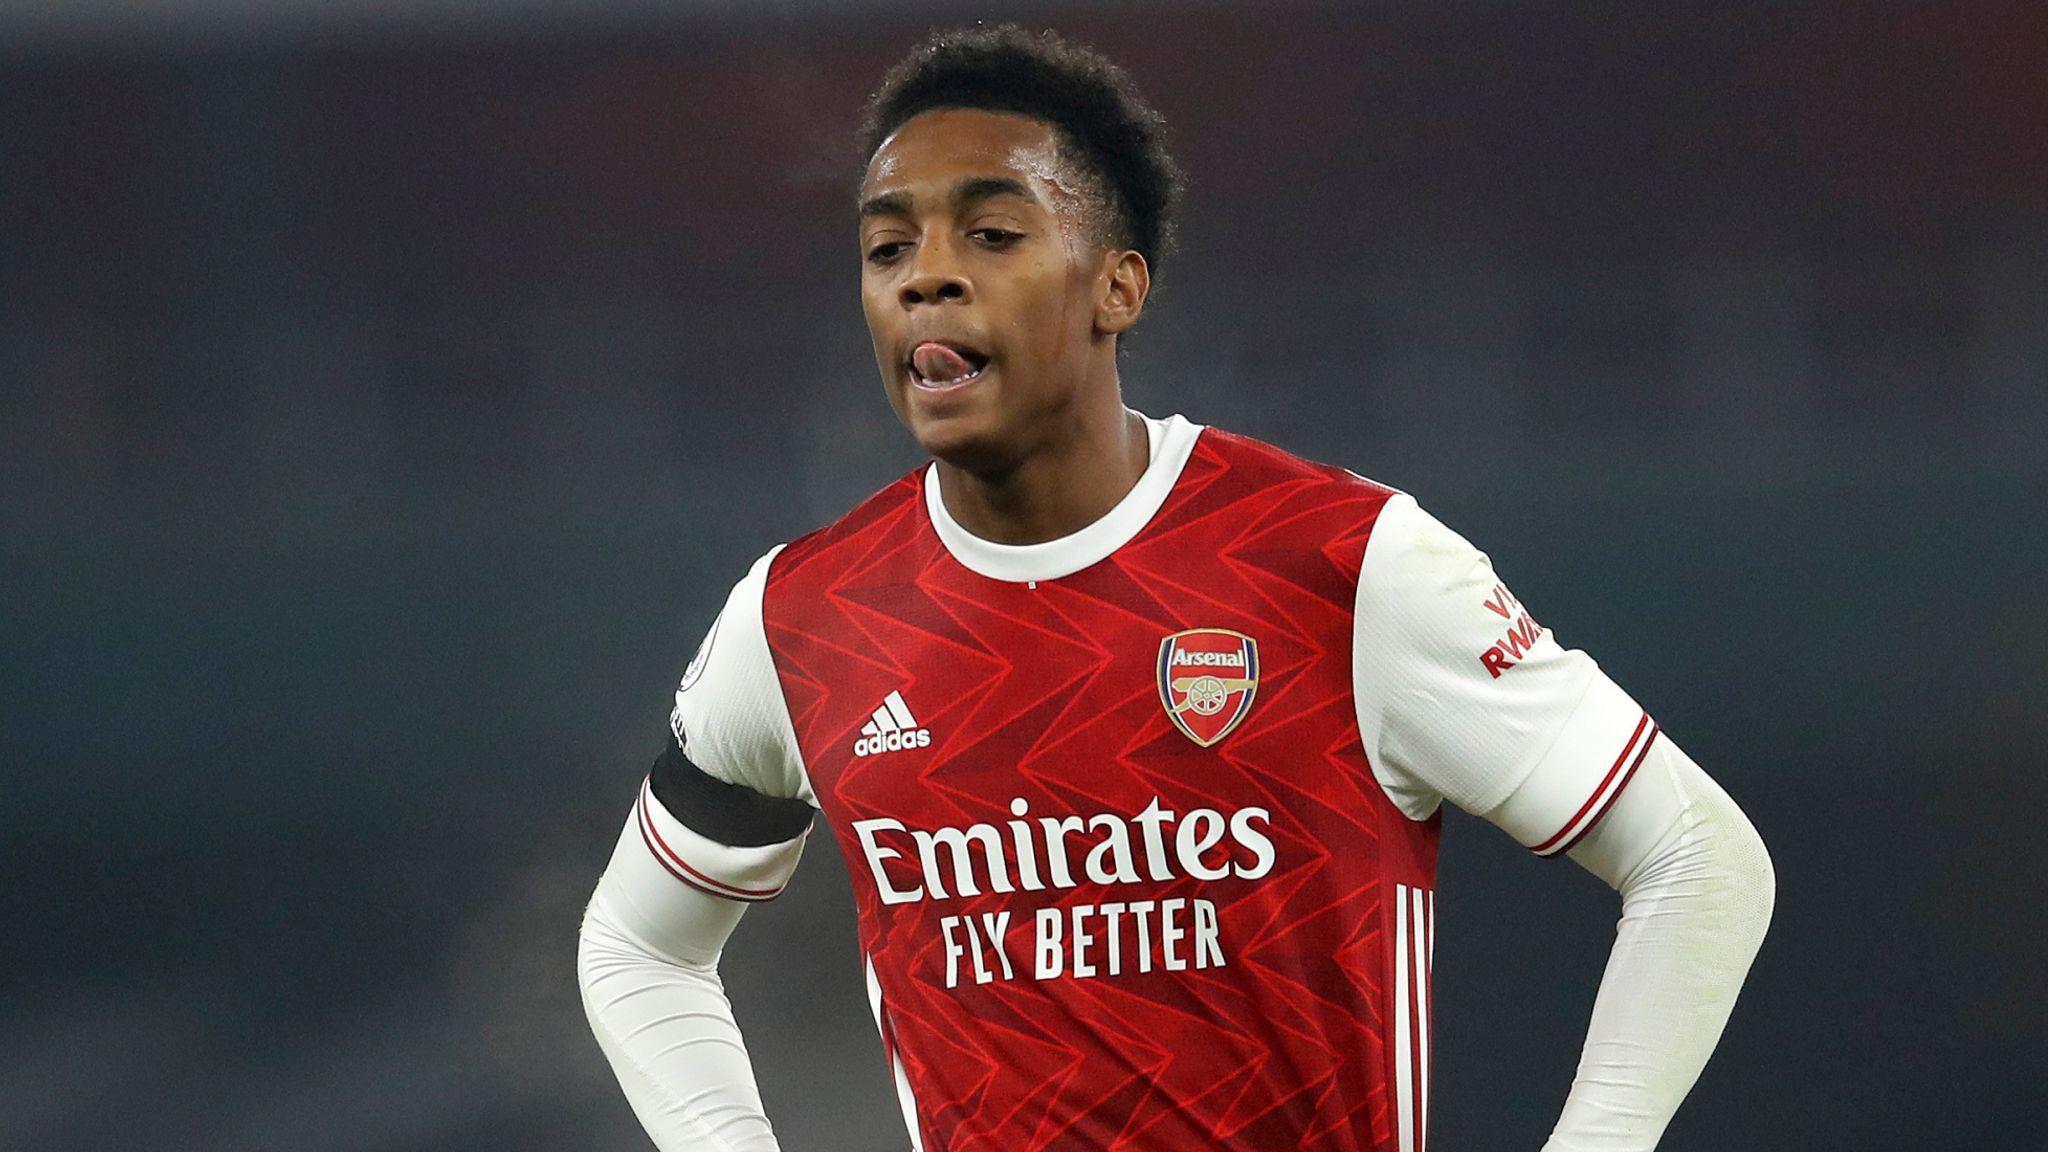 Football transfers january 2021 betting make money dutch betting